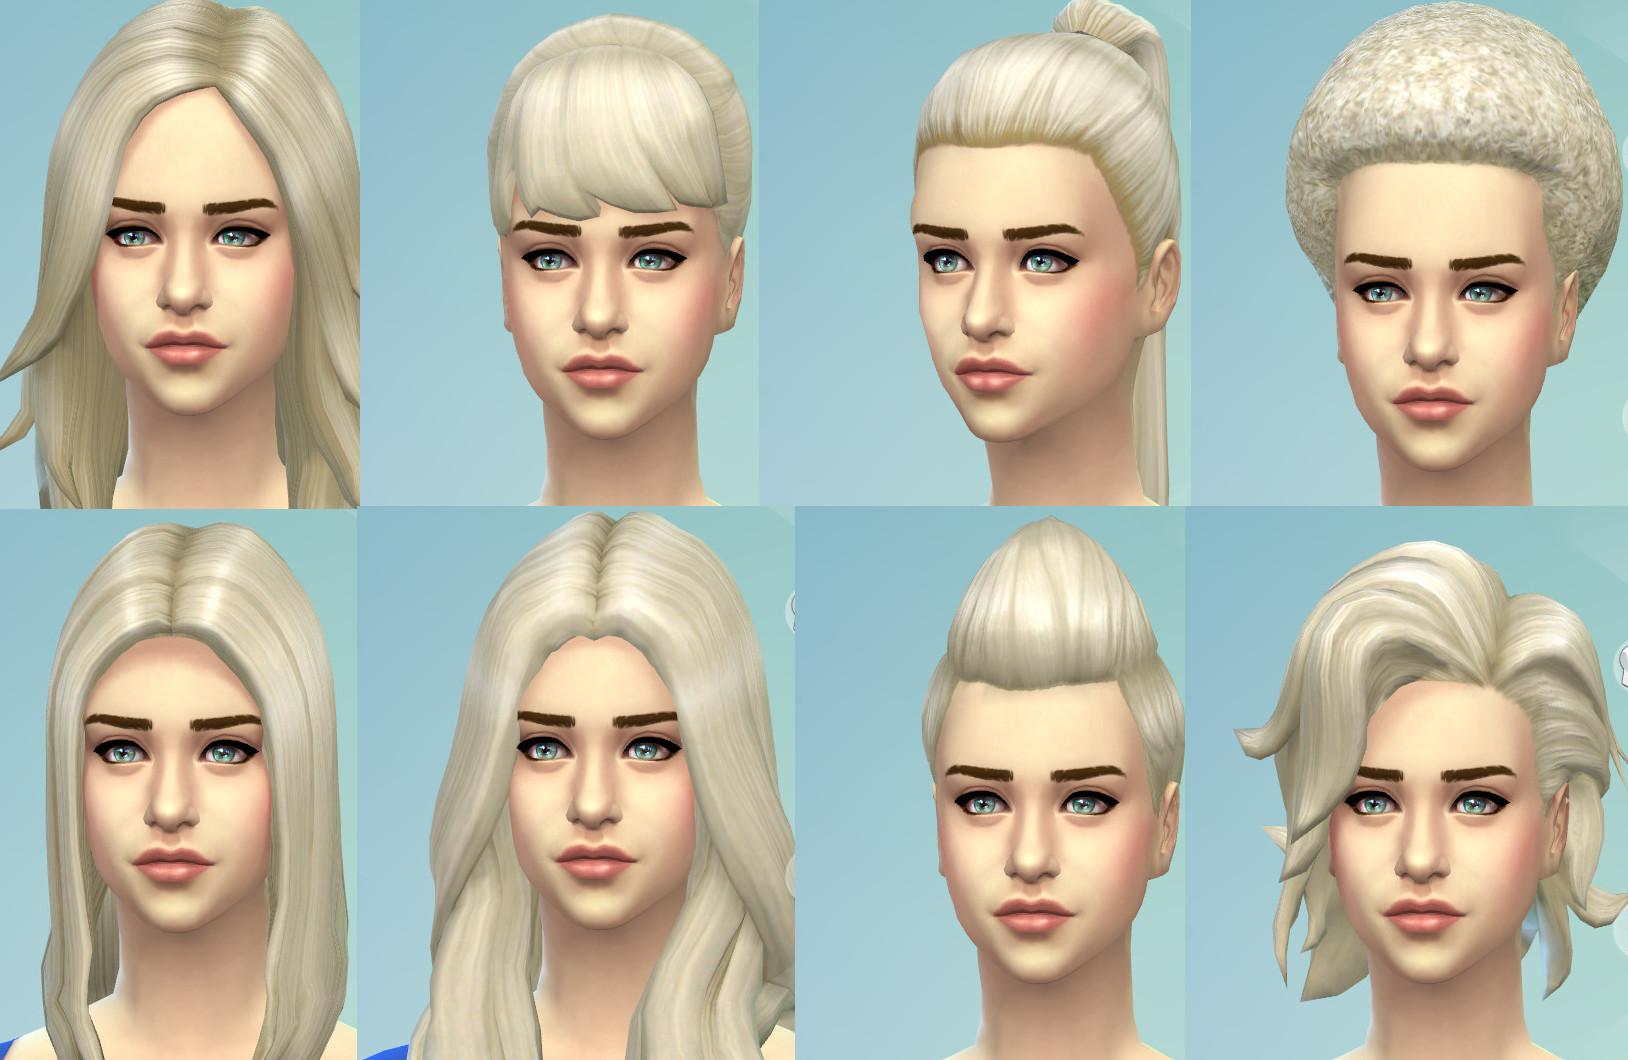 Mod The Sims - 'Targaryen Blonde' - New Non-Default Colour ...